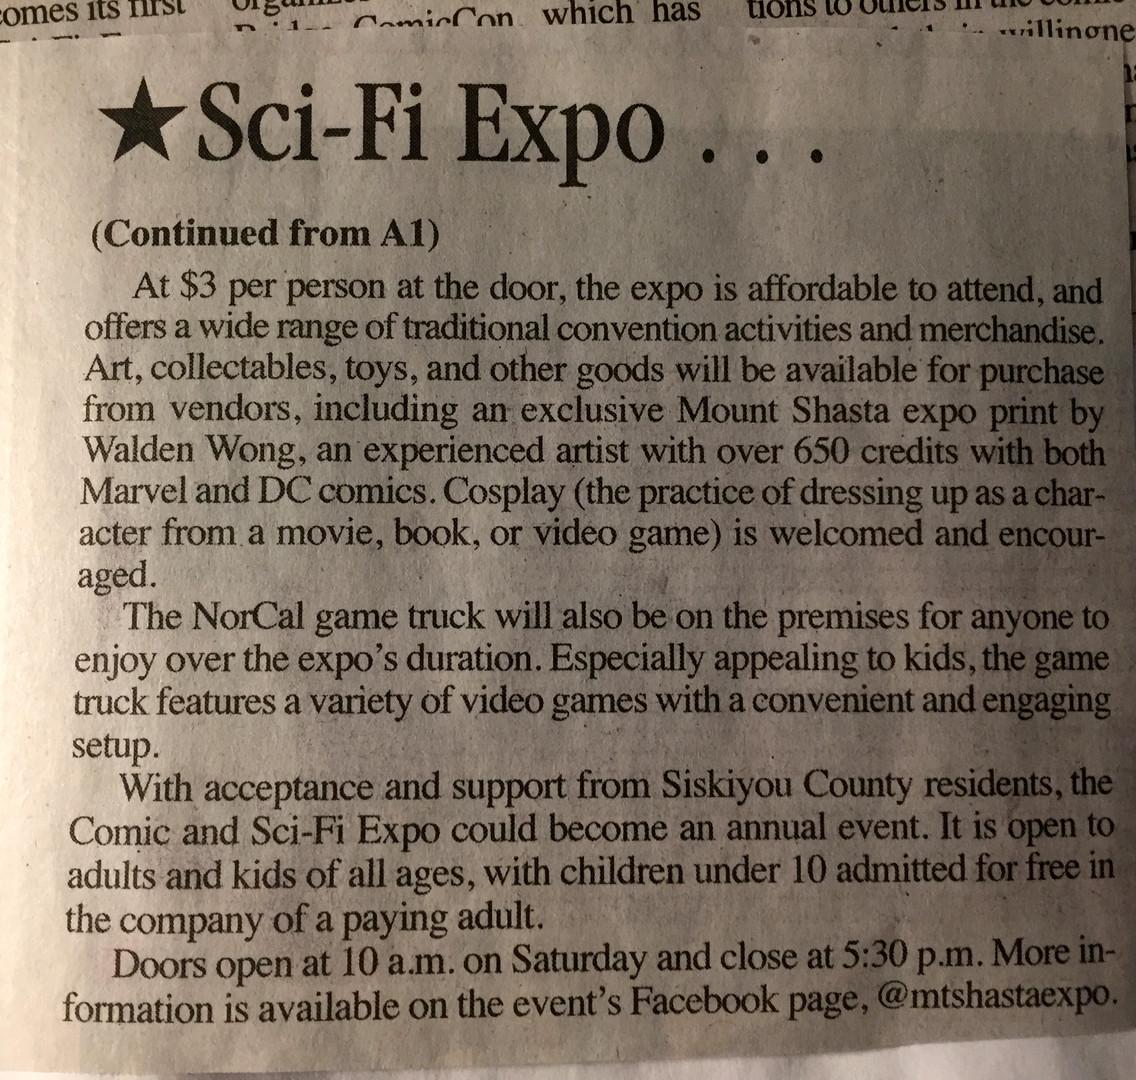 Sci-Fi Expo, cont